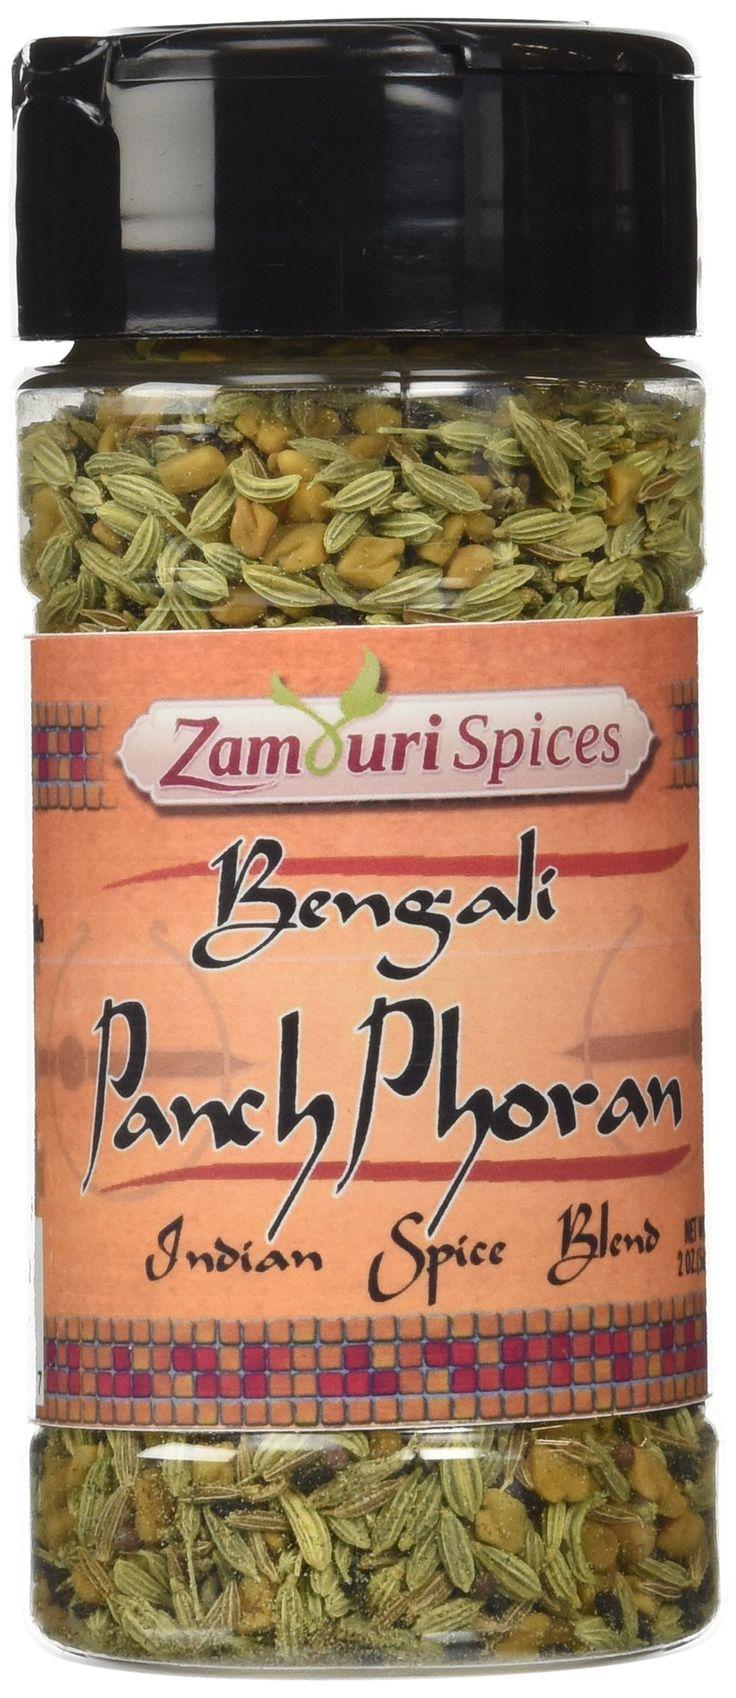 Bengali Panch Phoran 2 Oz By Zamouri Spices